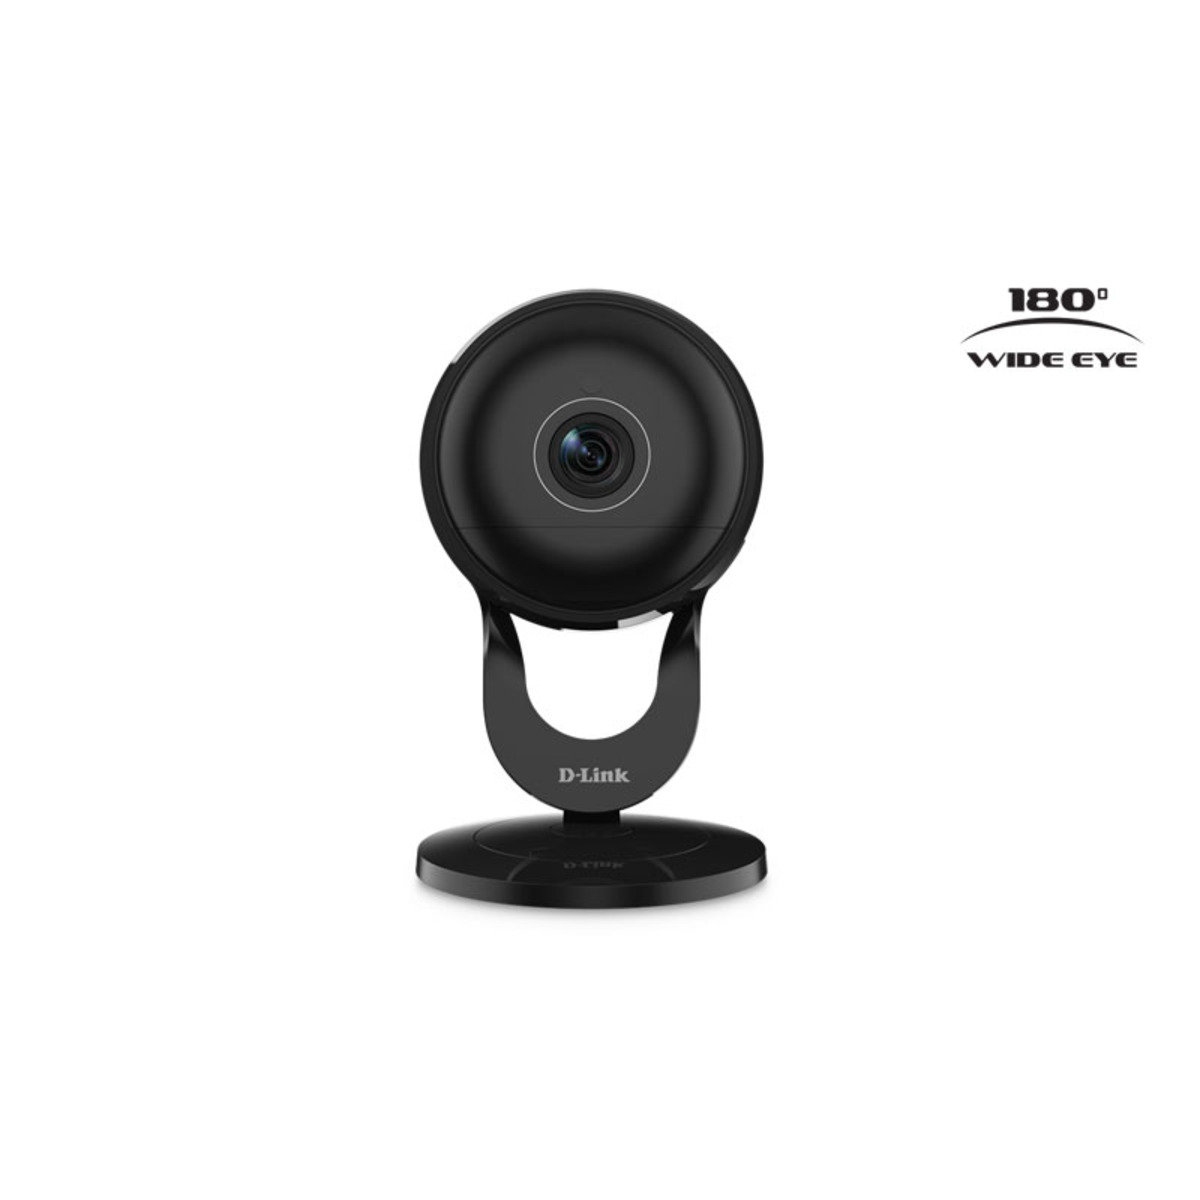 1080p 全高清超廣角180°無線網絡攝影機 DCS-2630L